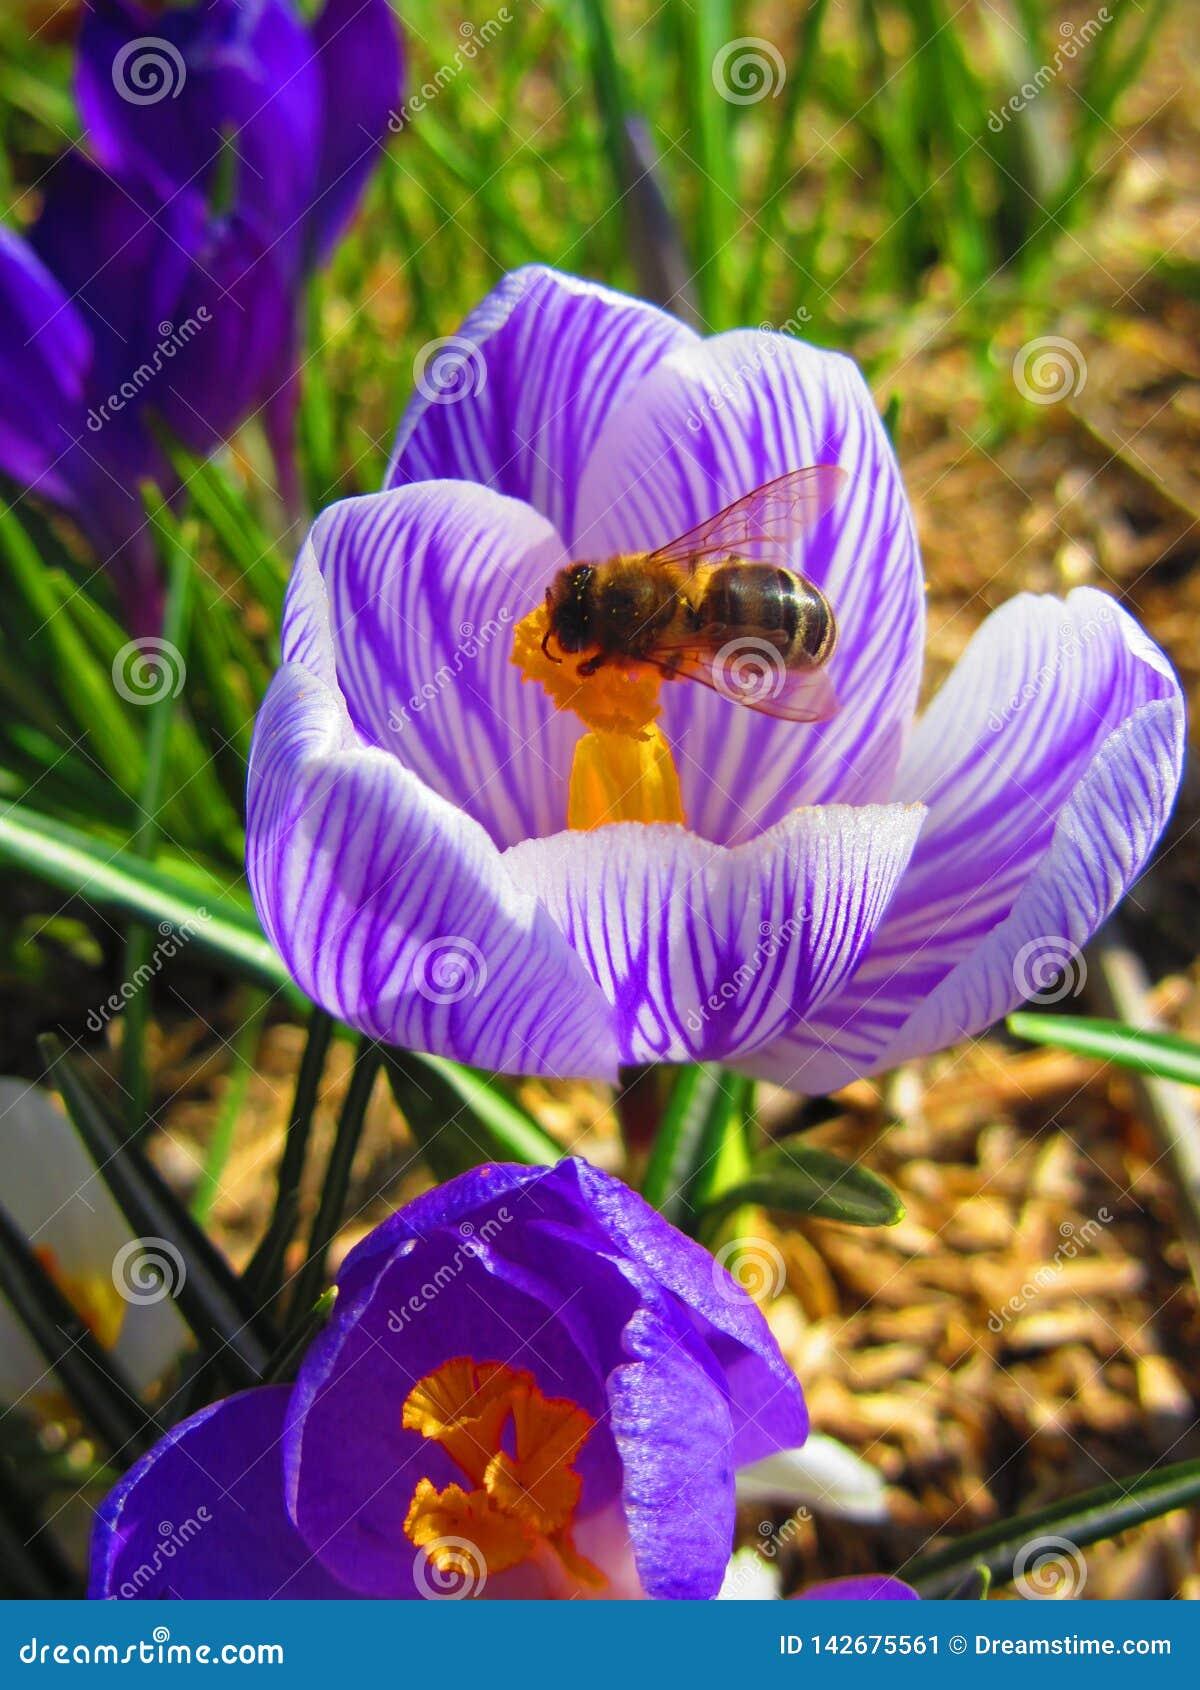 Bee is on the beautiful spring crocus